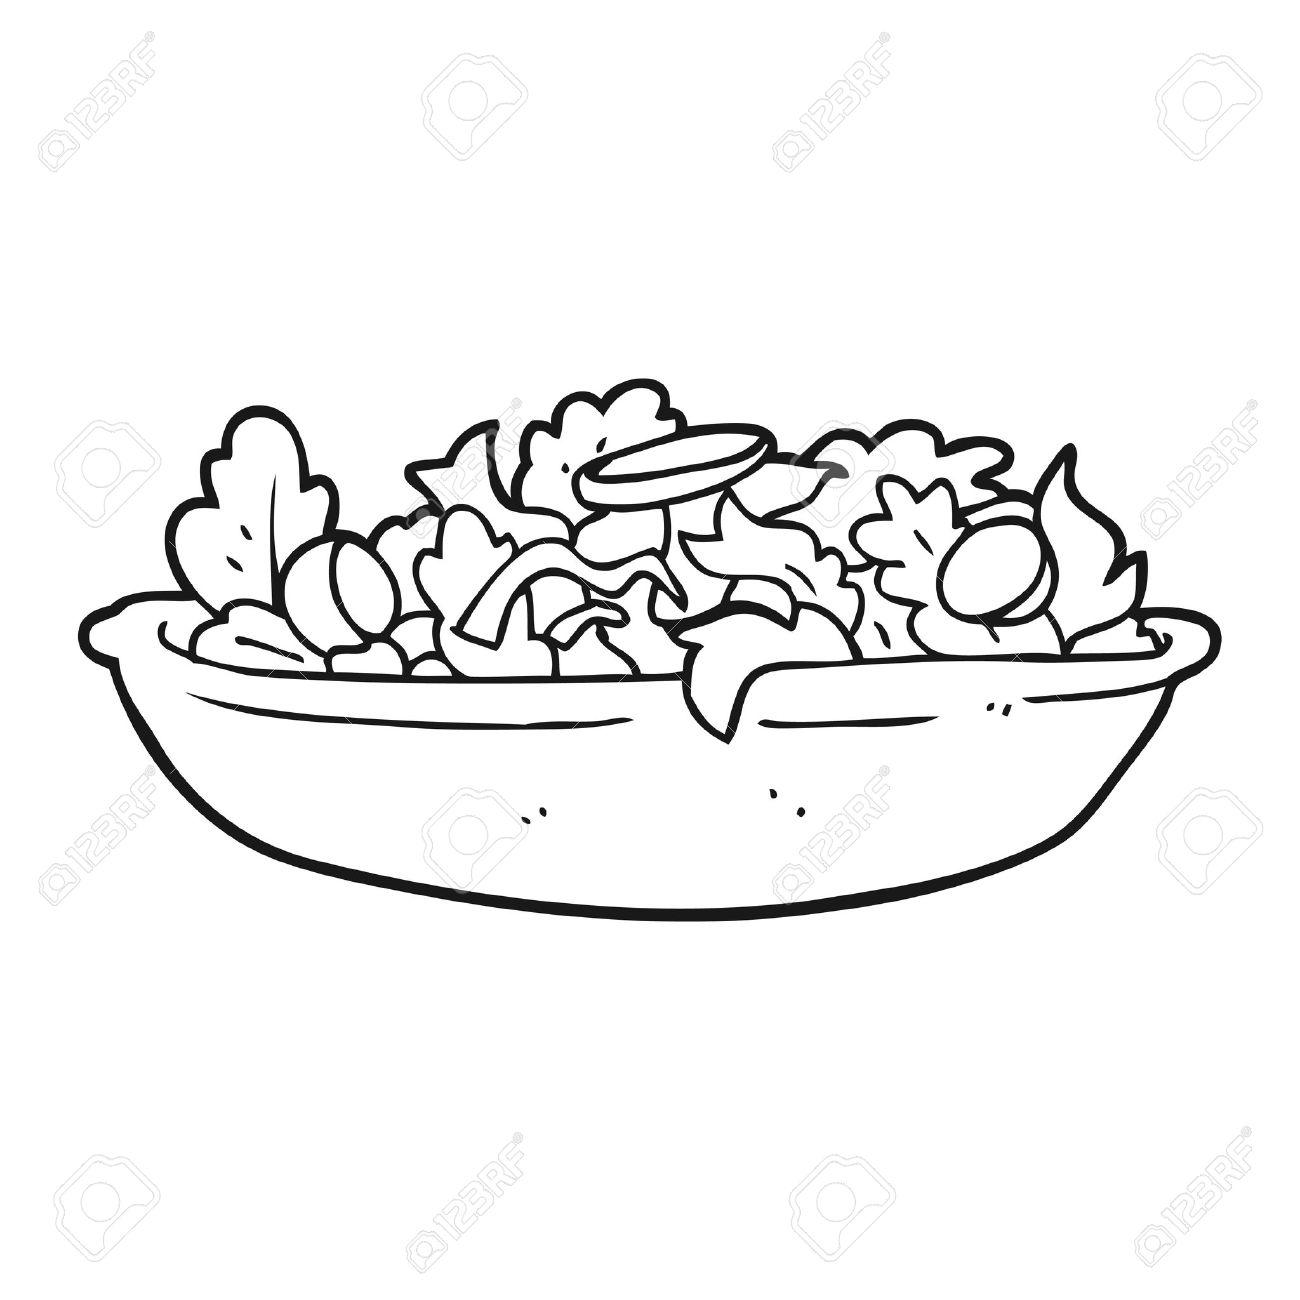 freehand drawn black and white cartoon salad - 53102373